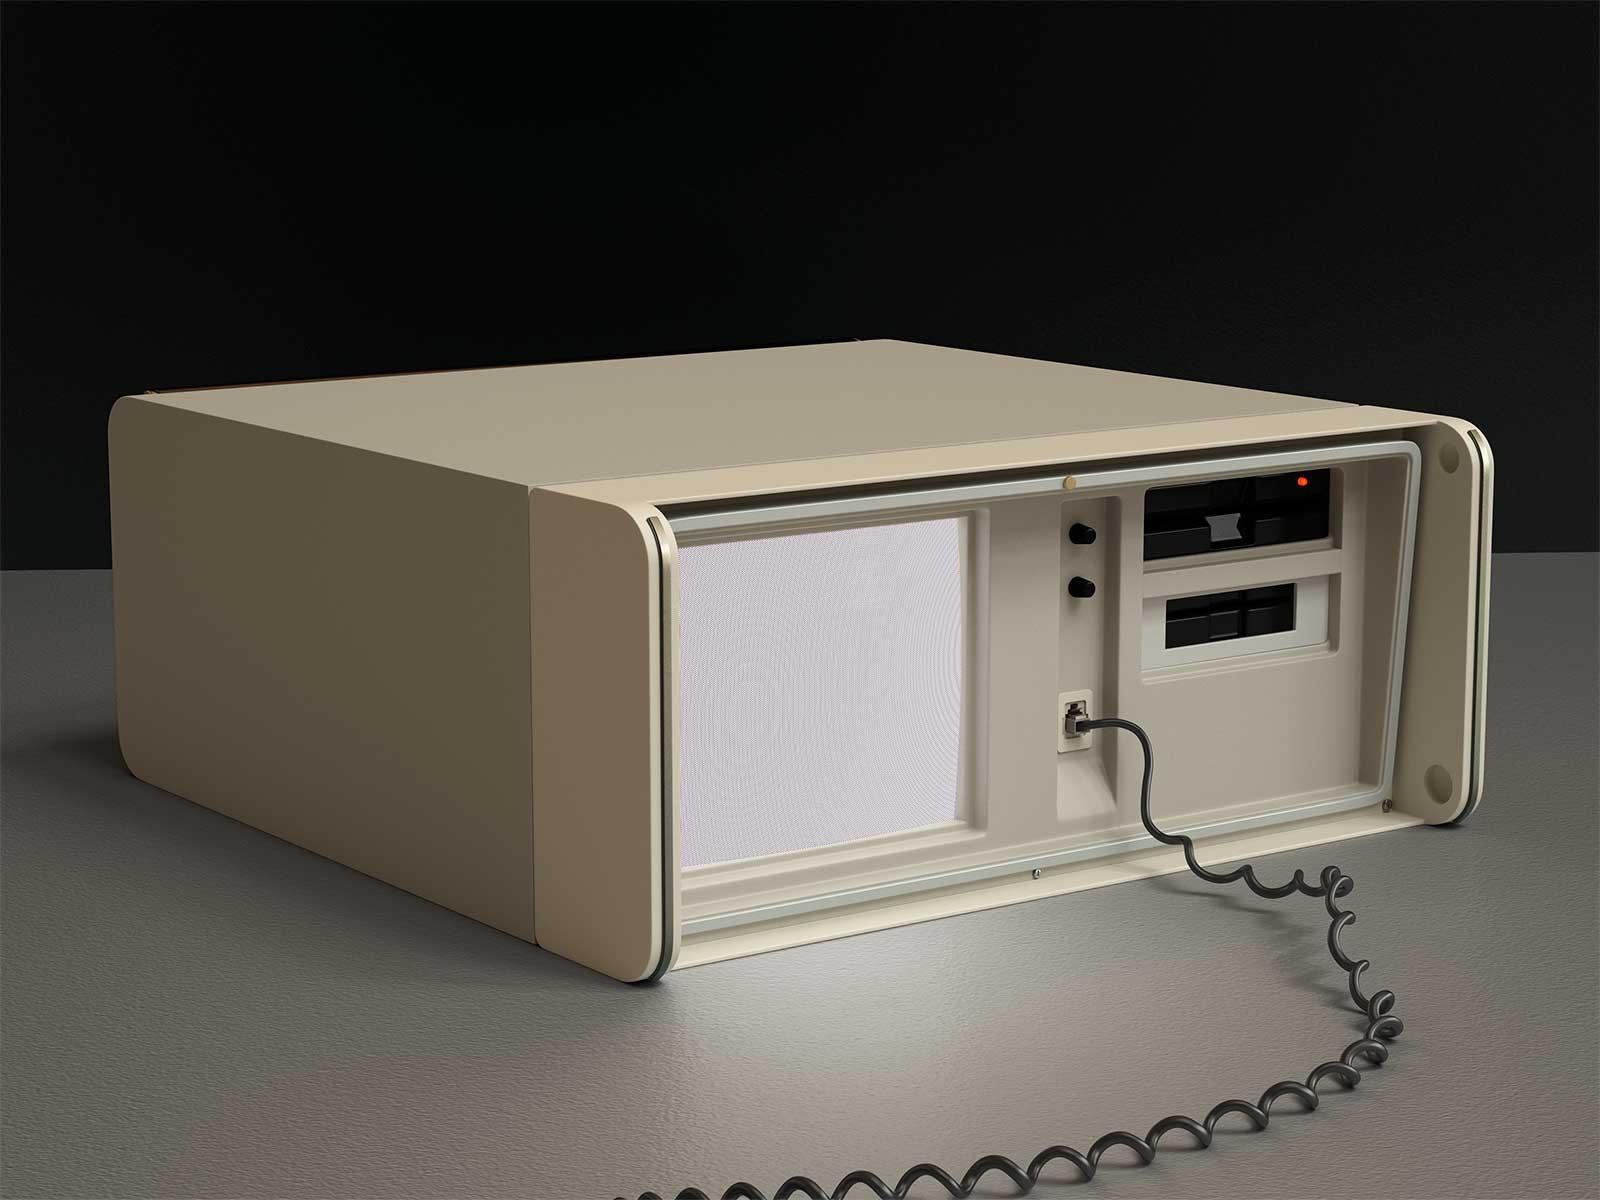 Monitor I 02, CGI Fine Art Print, 39 x 52 cm, 2013